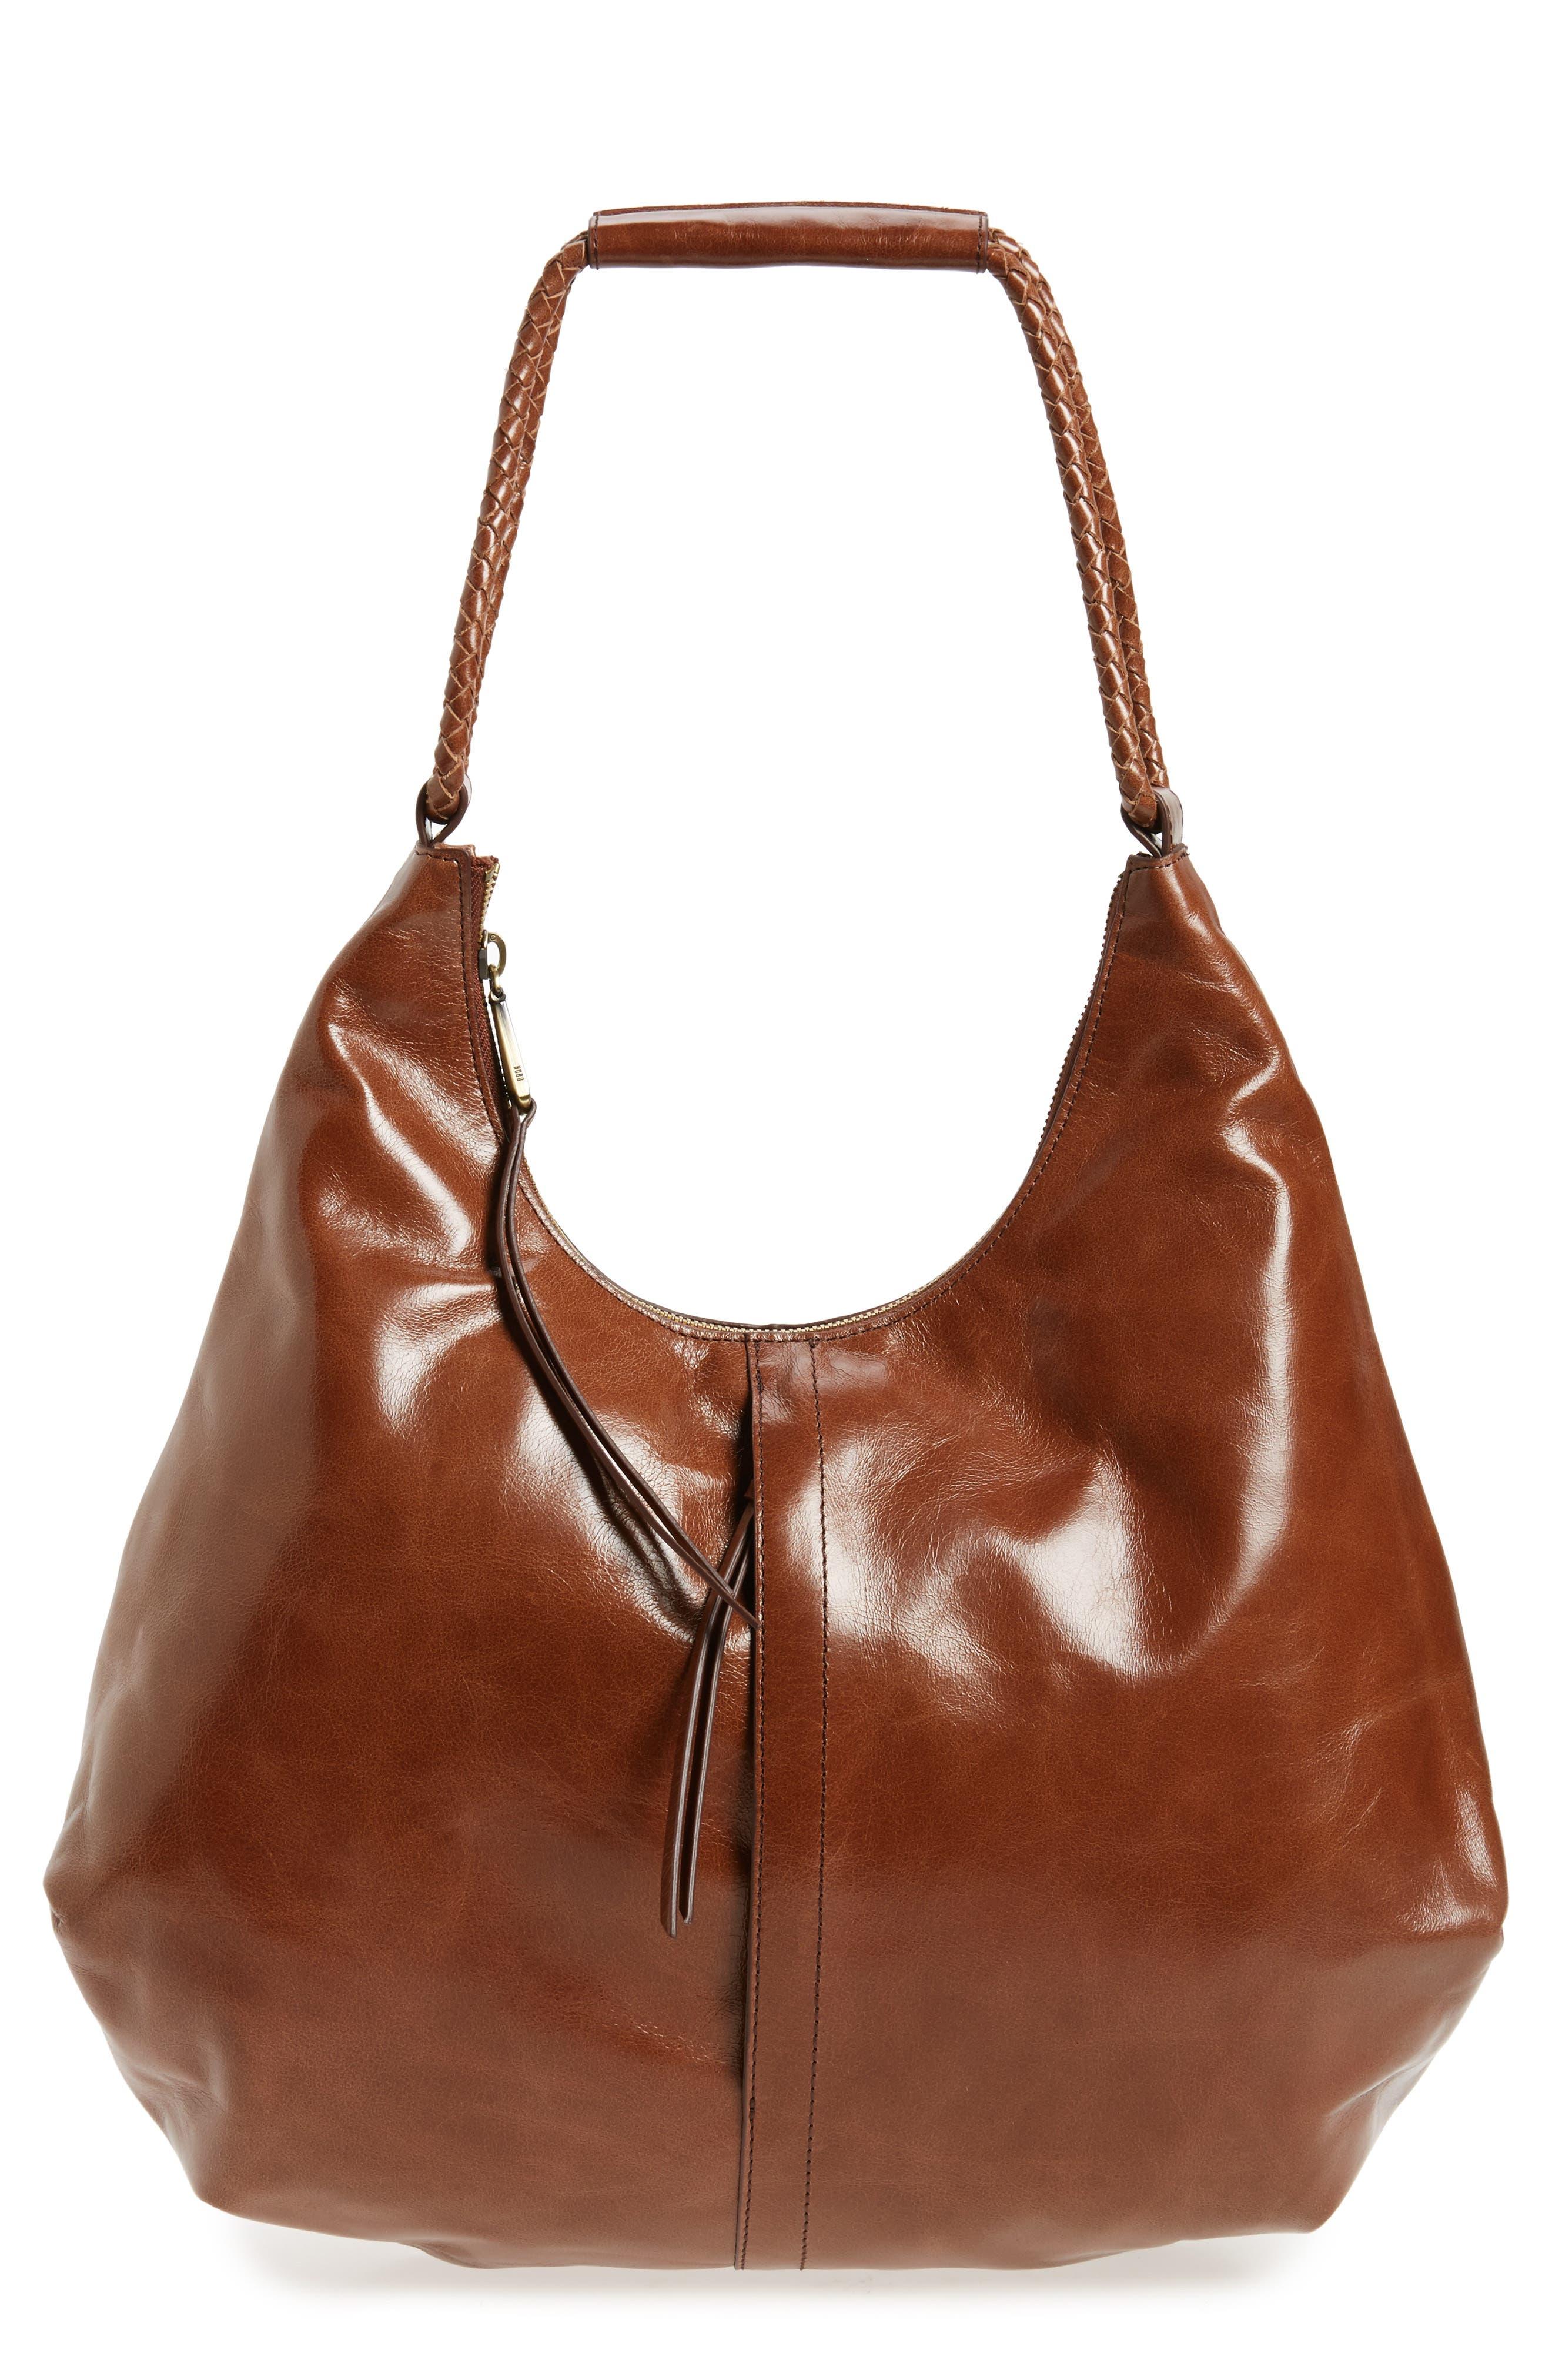 Hobo Bags & Wallets   Nordstrom